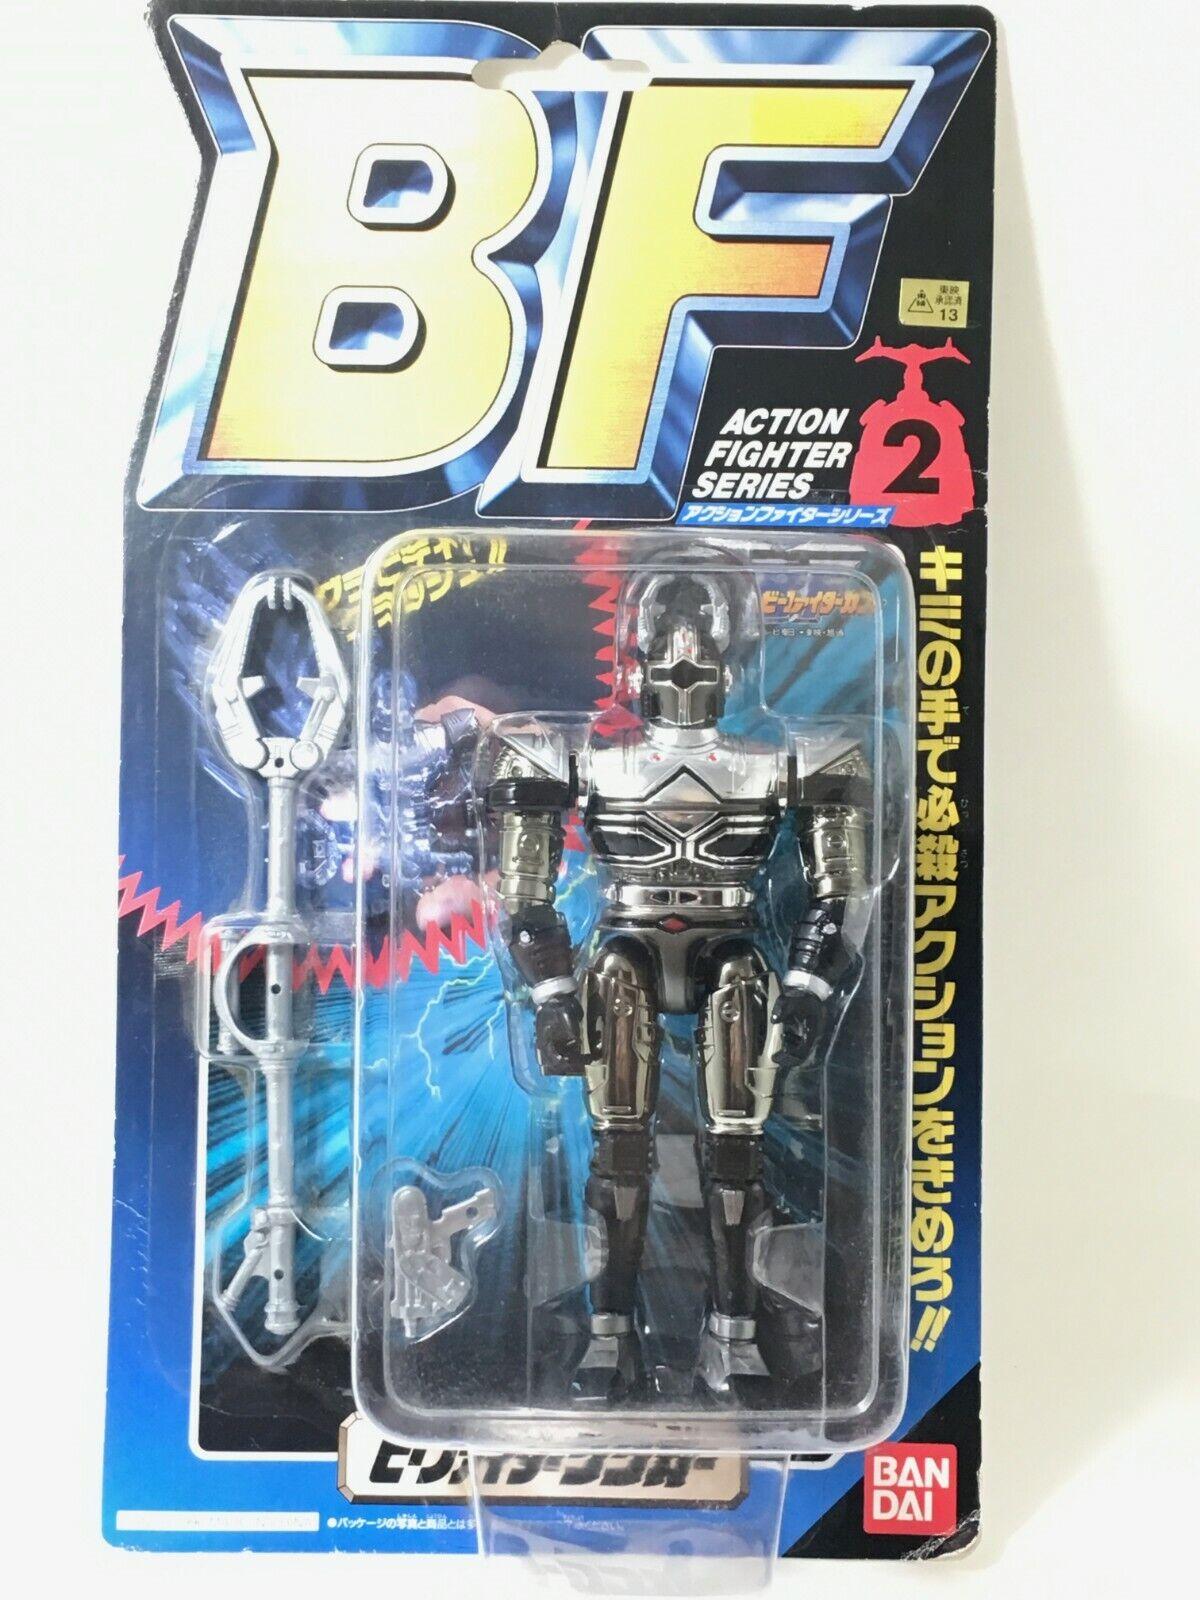 Beai B-combatiente Kabuto  azione combatiente series 2 Bee combatiente Kuwager 1996 japan  più preferenziale